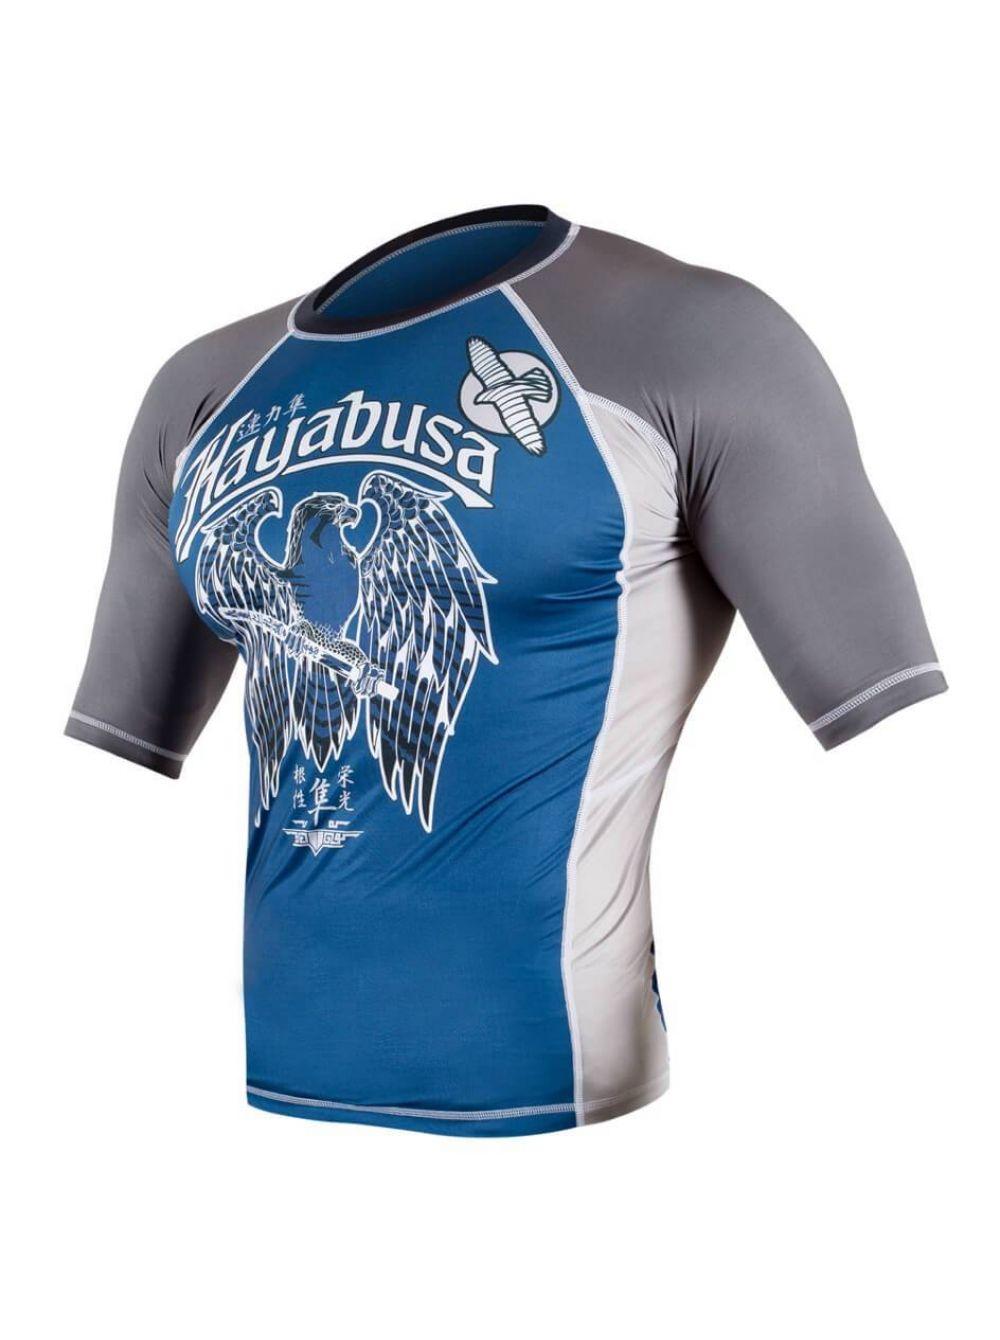 Купить Рашгард Hayabusa Showdown Short Sleeve- Grey/Blue, 6374_gy_bl